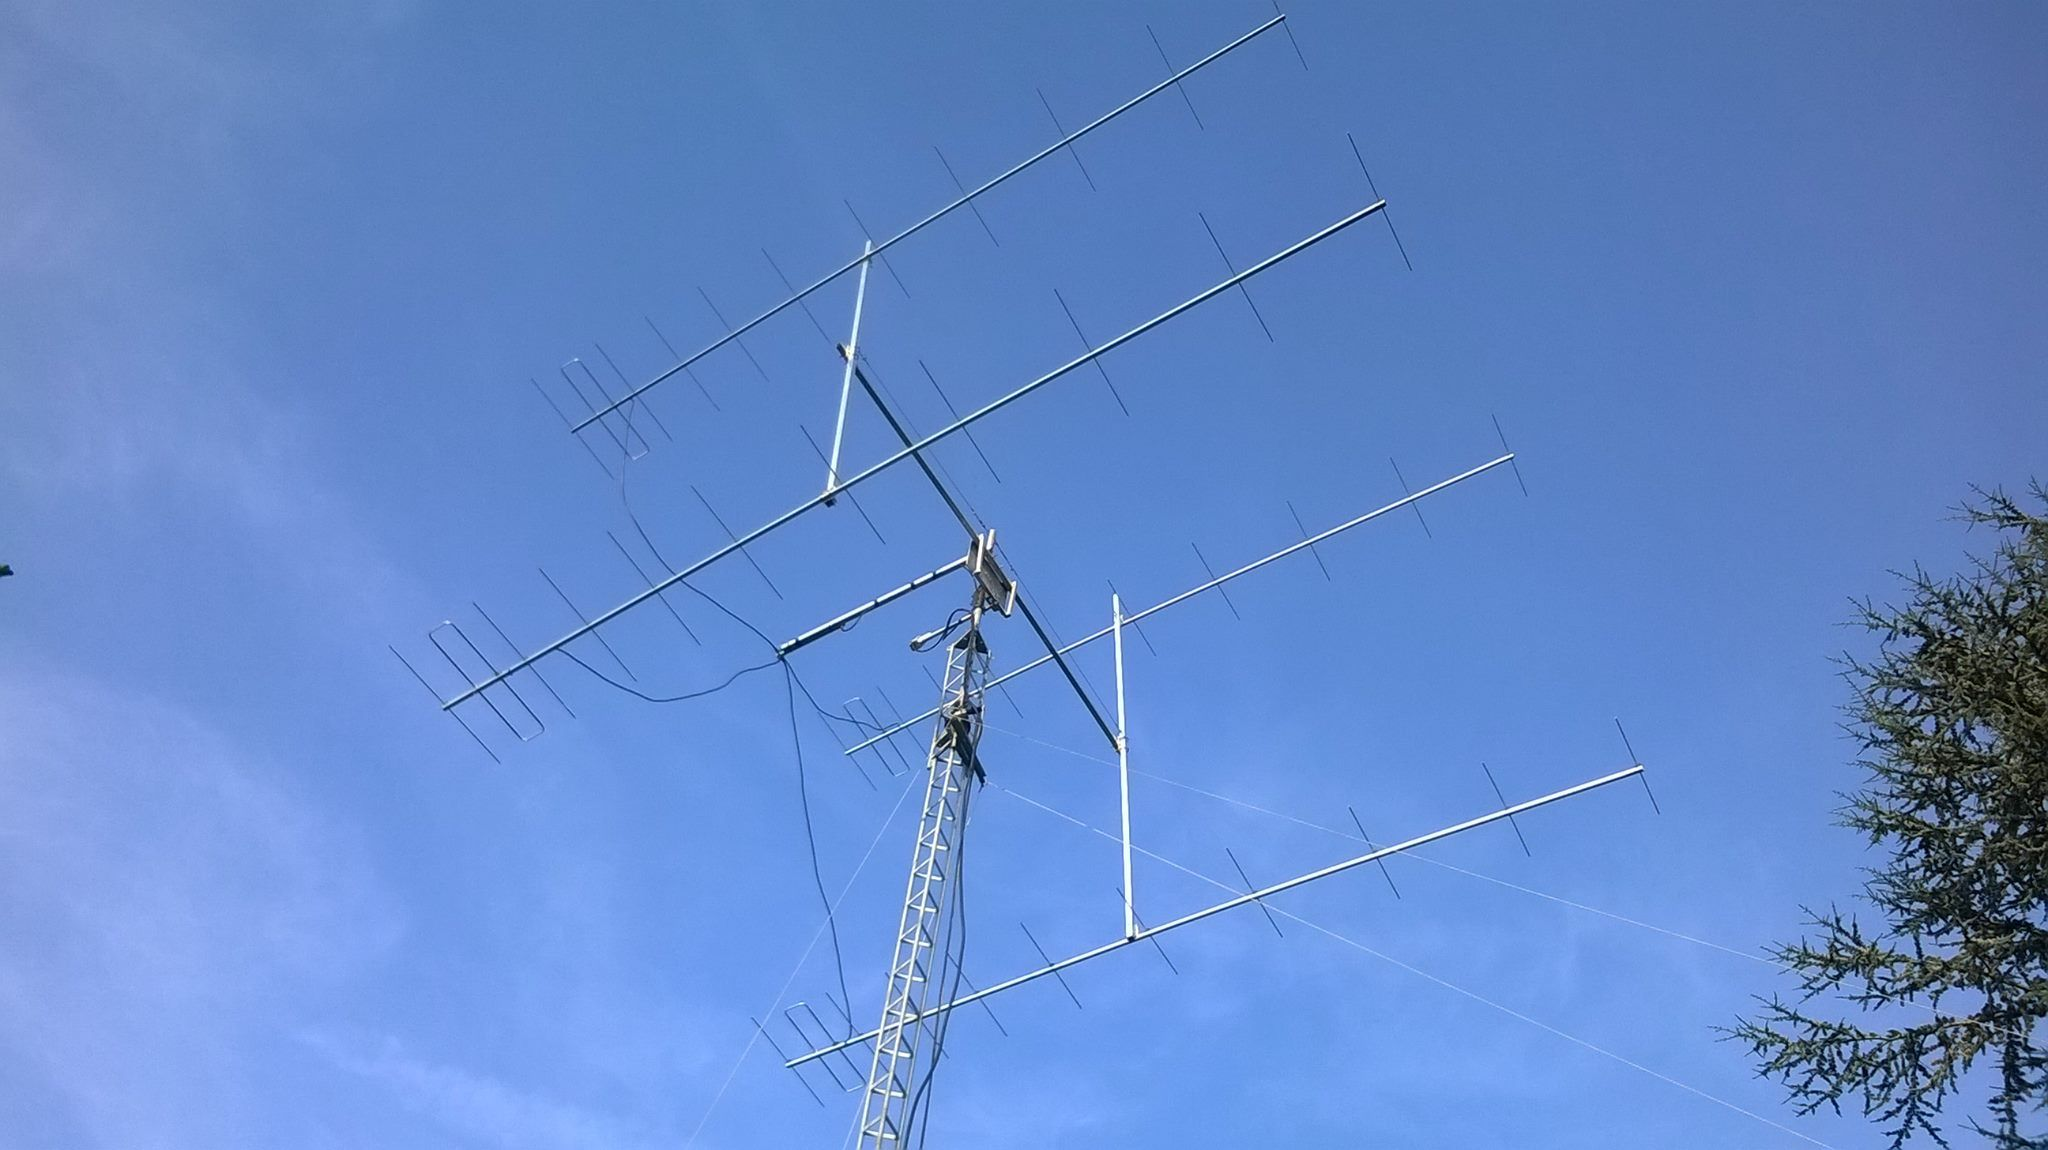 G0ksc Simple To Build High Performance Yagi And Quad Antennas Antenna Home Of The Lfa Free Designs For Ham Radio